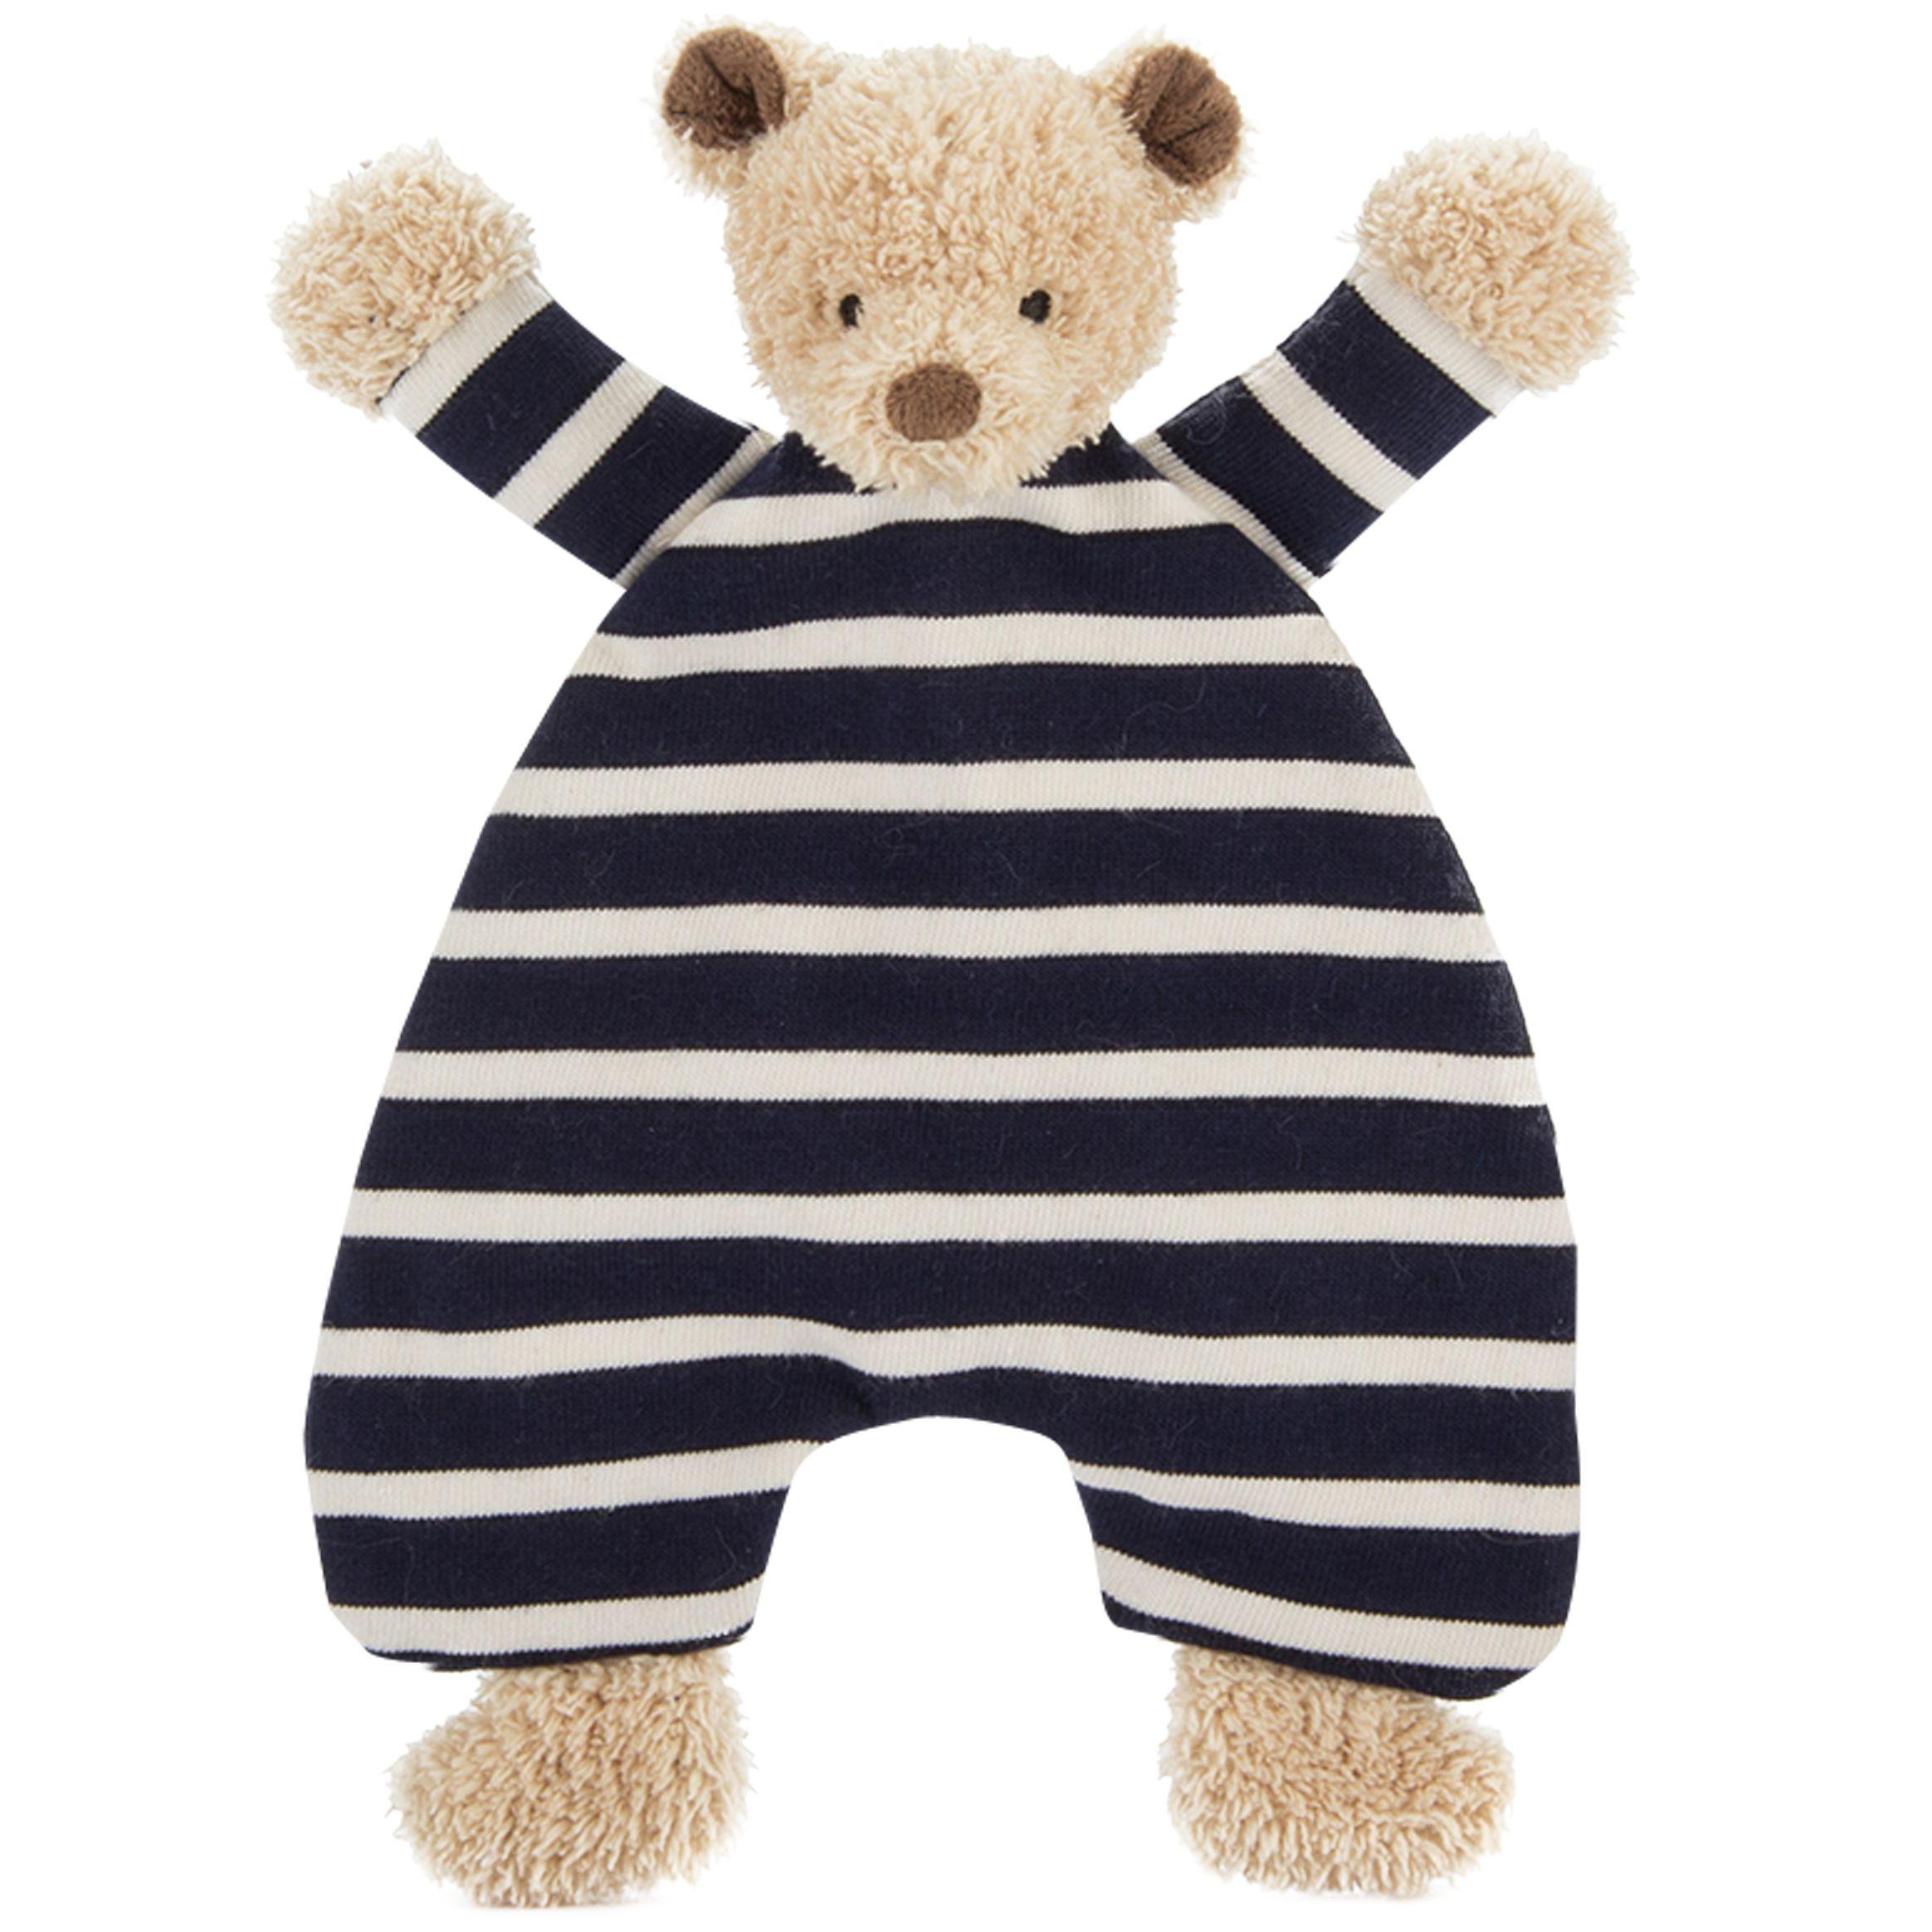 Jellycat Jellycat Breton Bear Soother Soft Toy